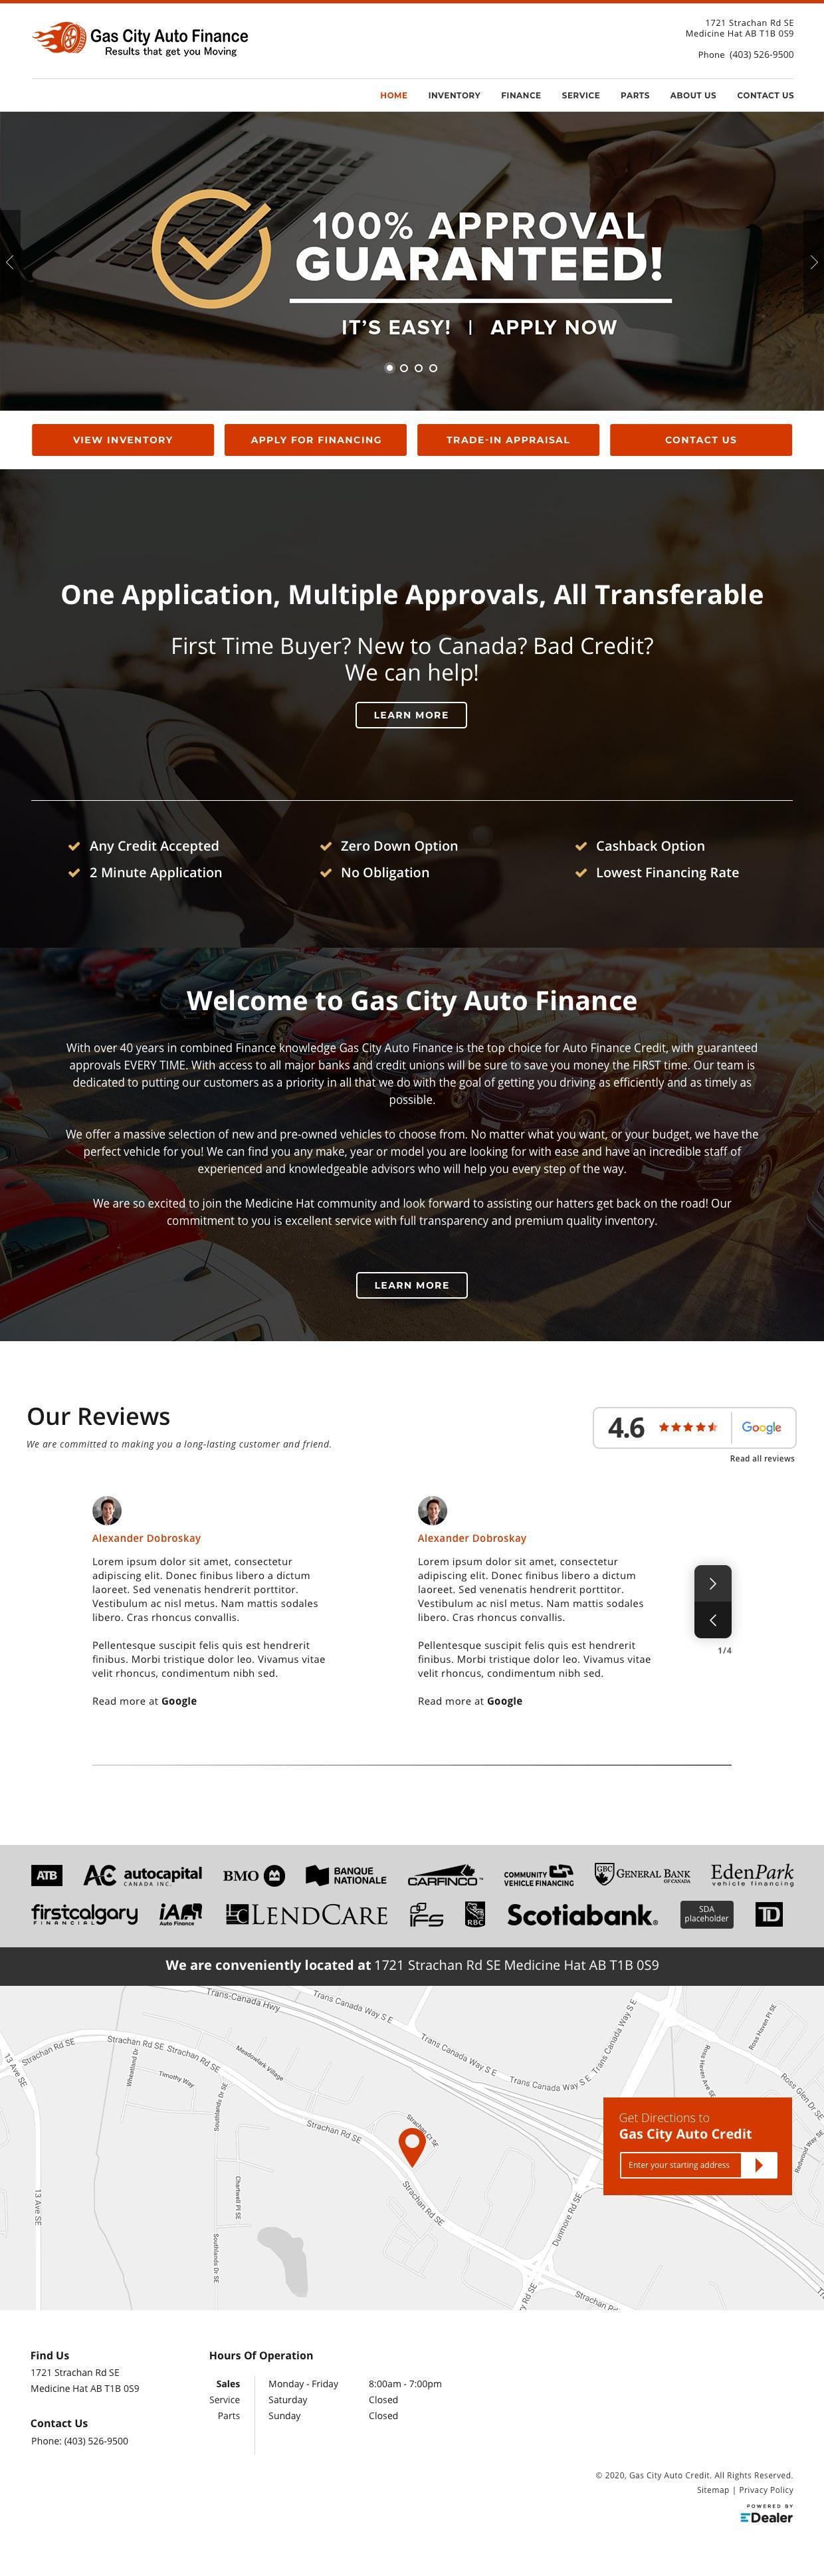 Gas City Auto Credit